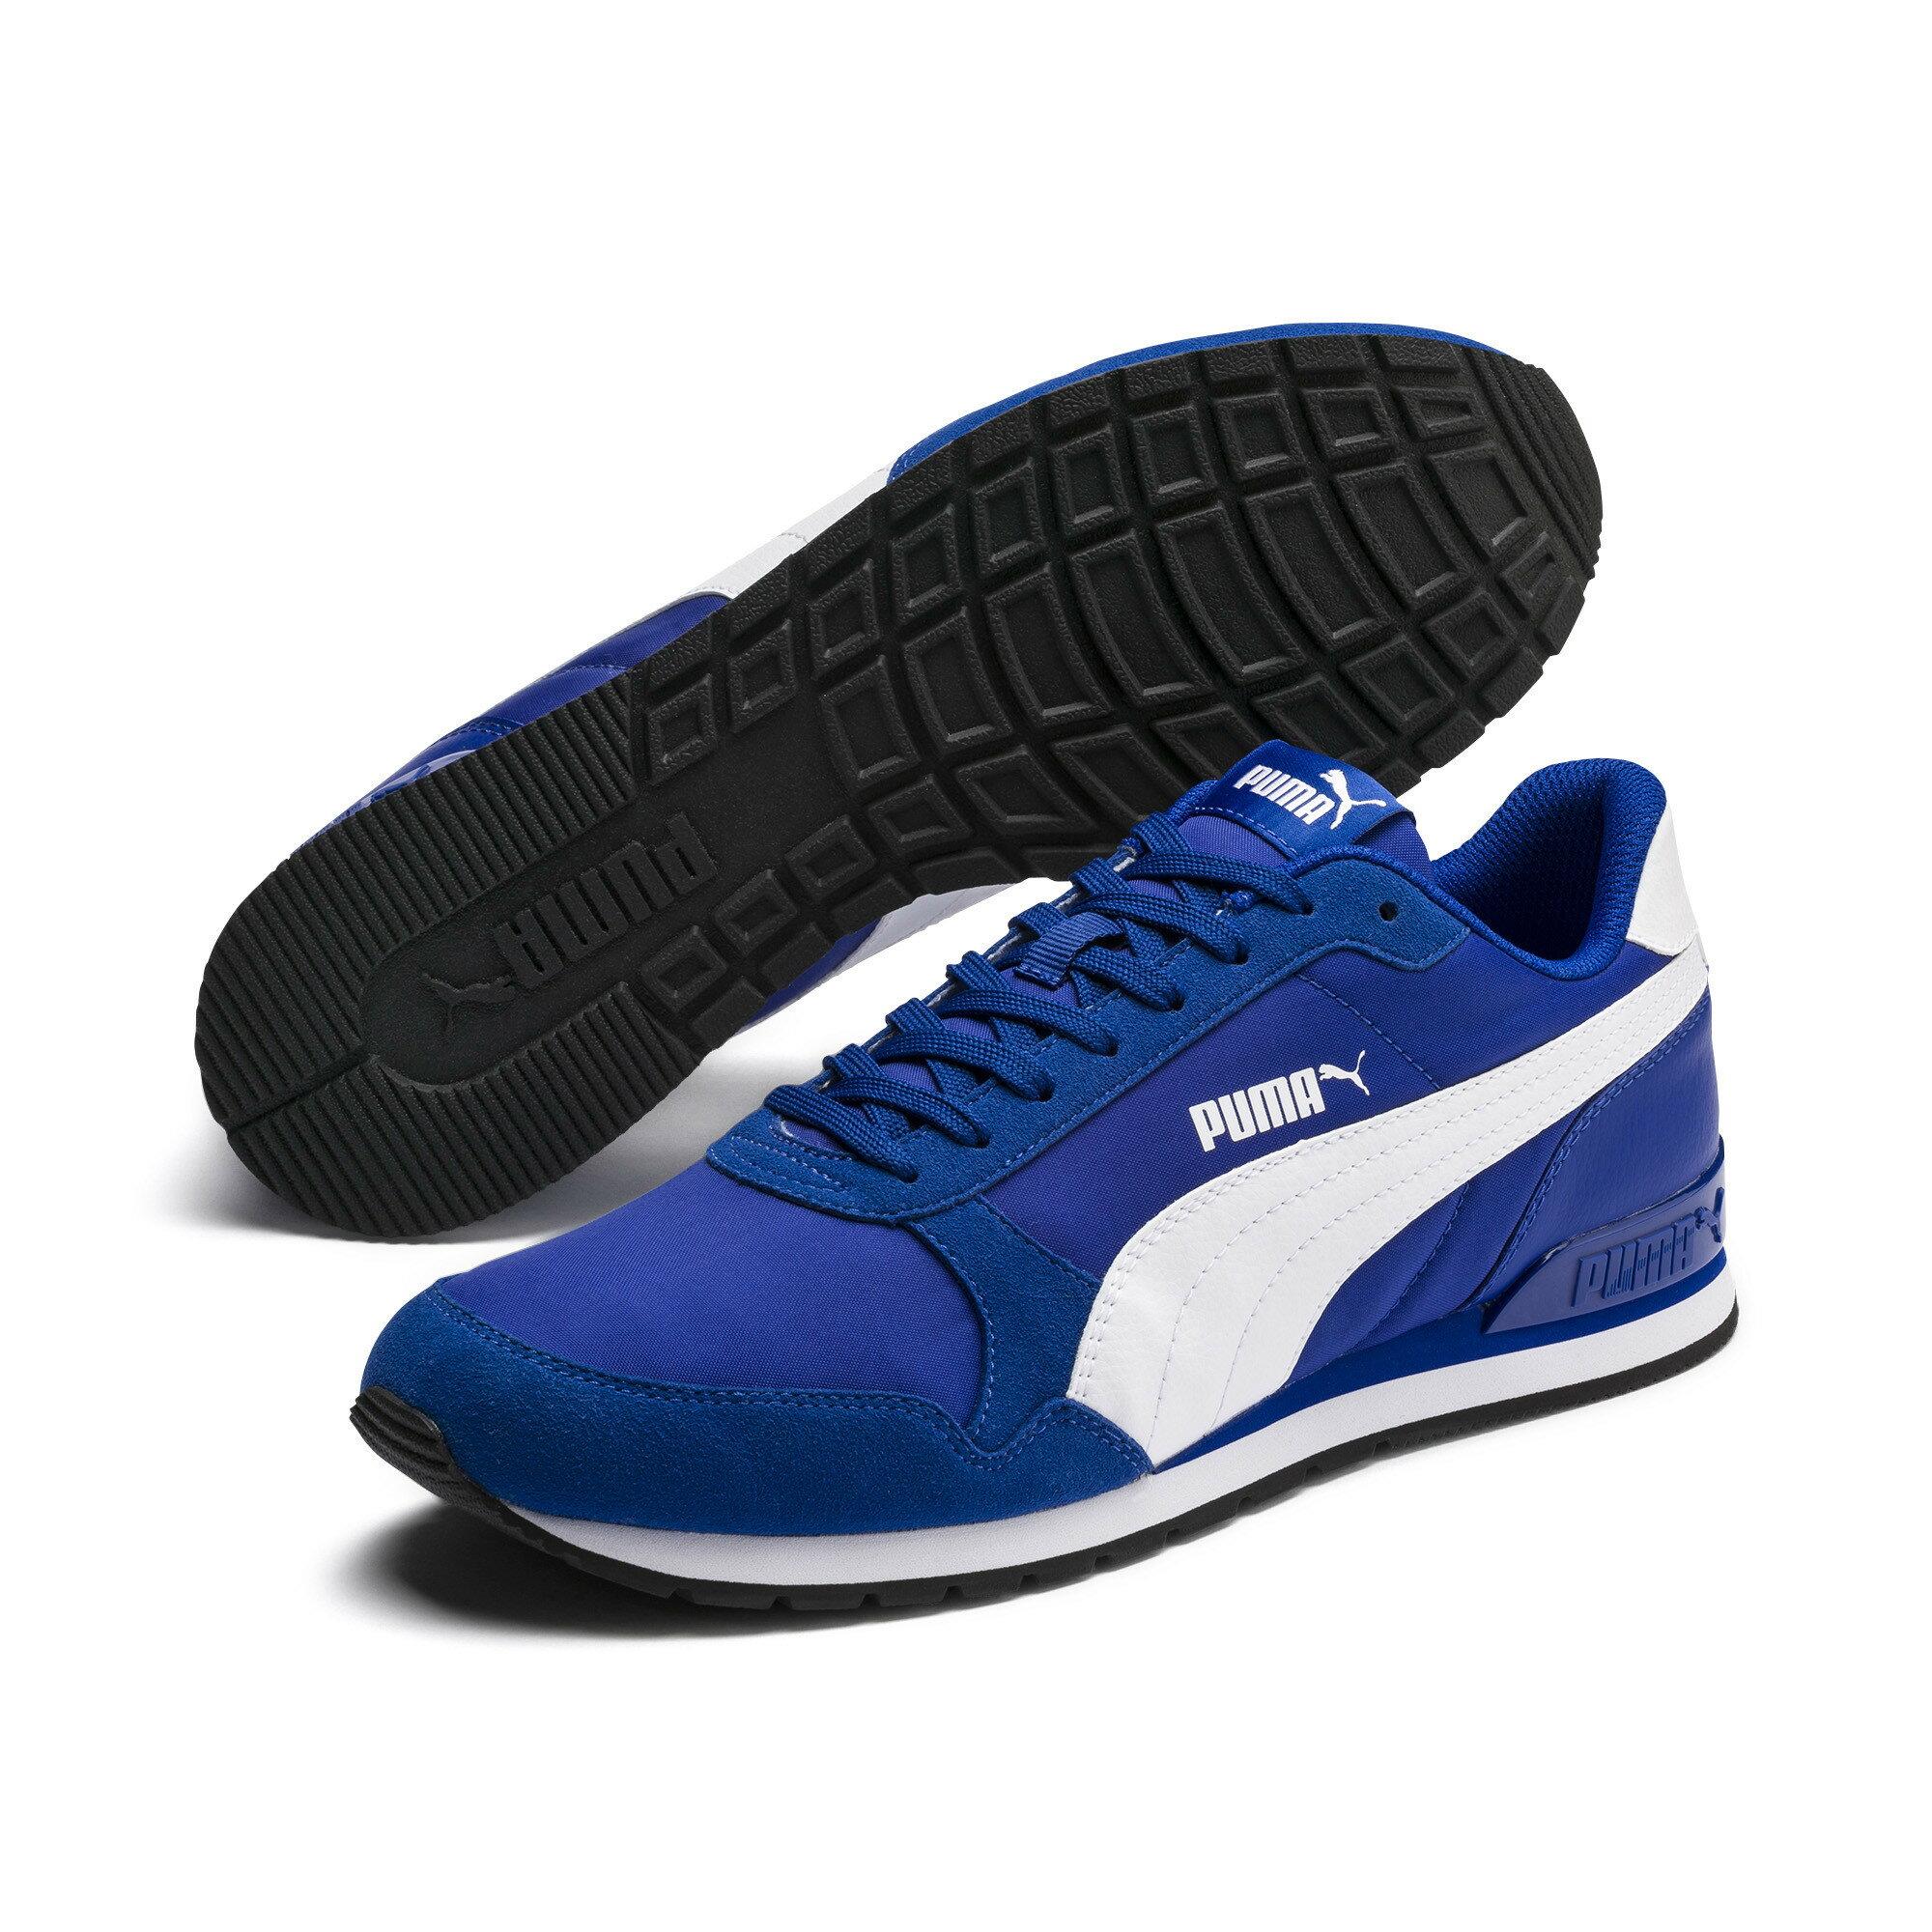 7d37d40604 Official Puma Store  PUMA ST Runner v2 NL Sneakers